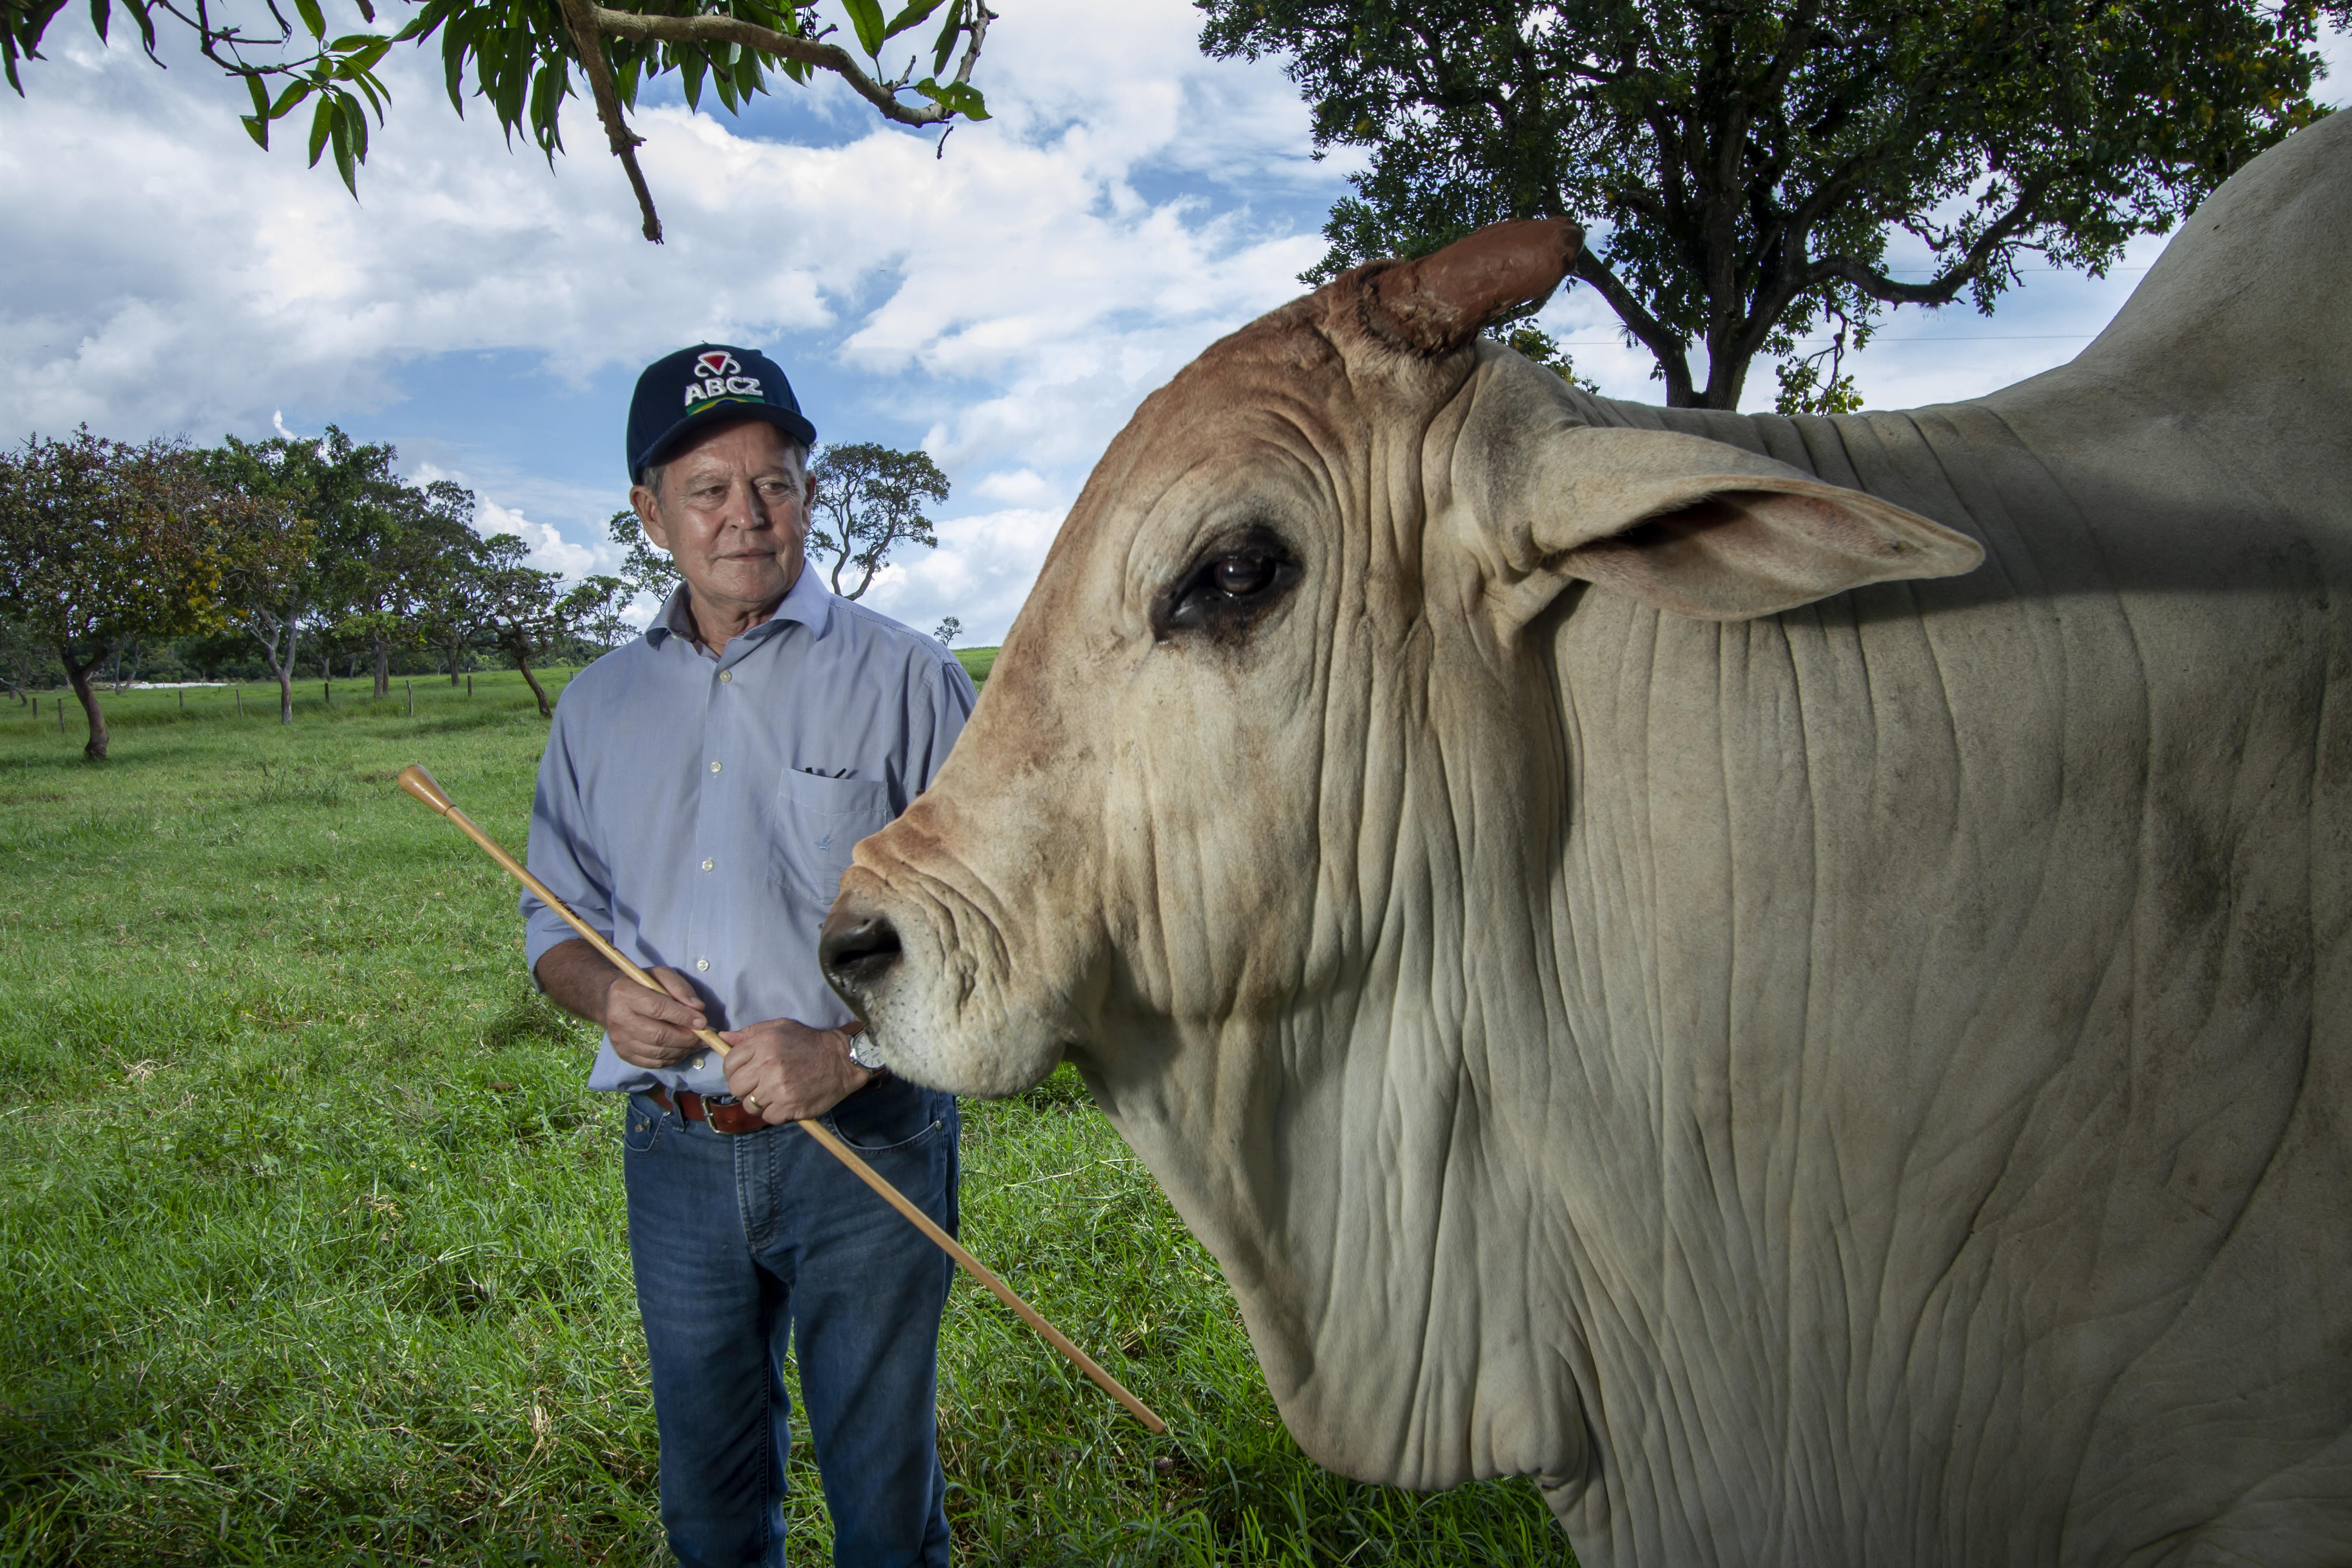 O criador Arnaldo Borges, presidente da ABCZ e o touro nelore Nasik, de 9 anos (Foto: Rogerio Albuquerque)